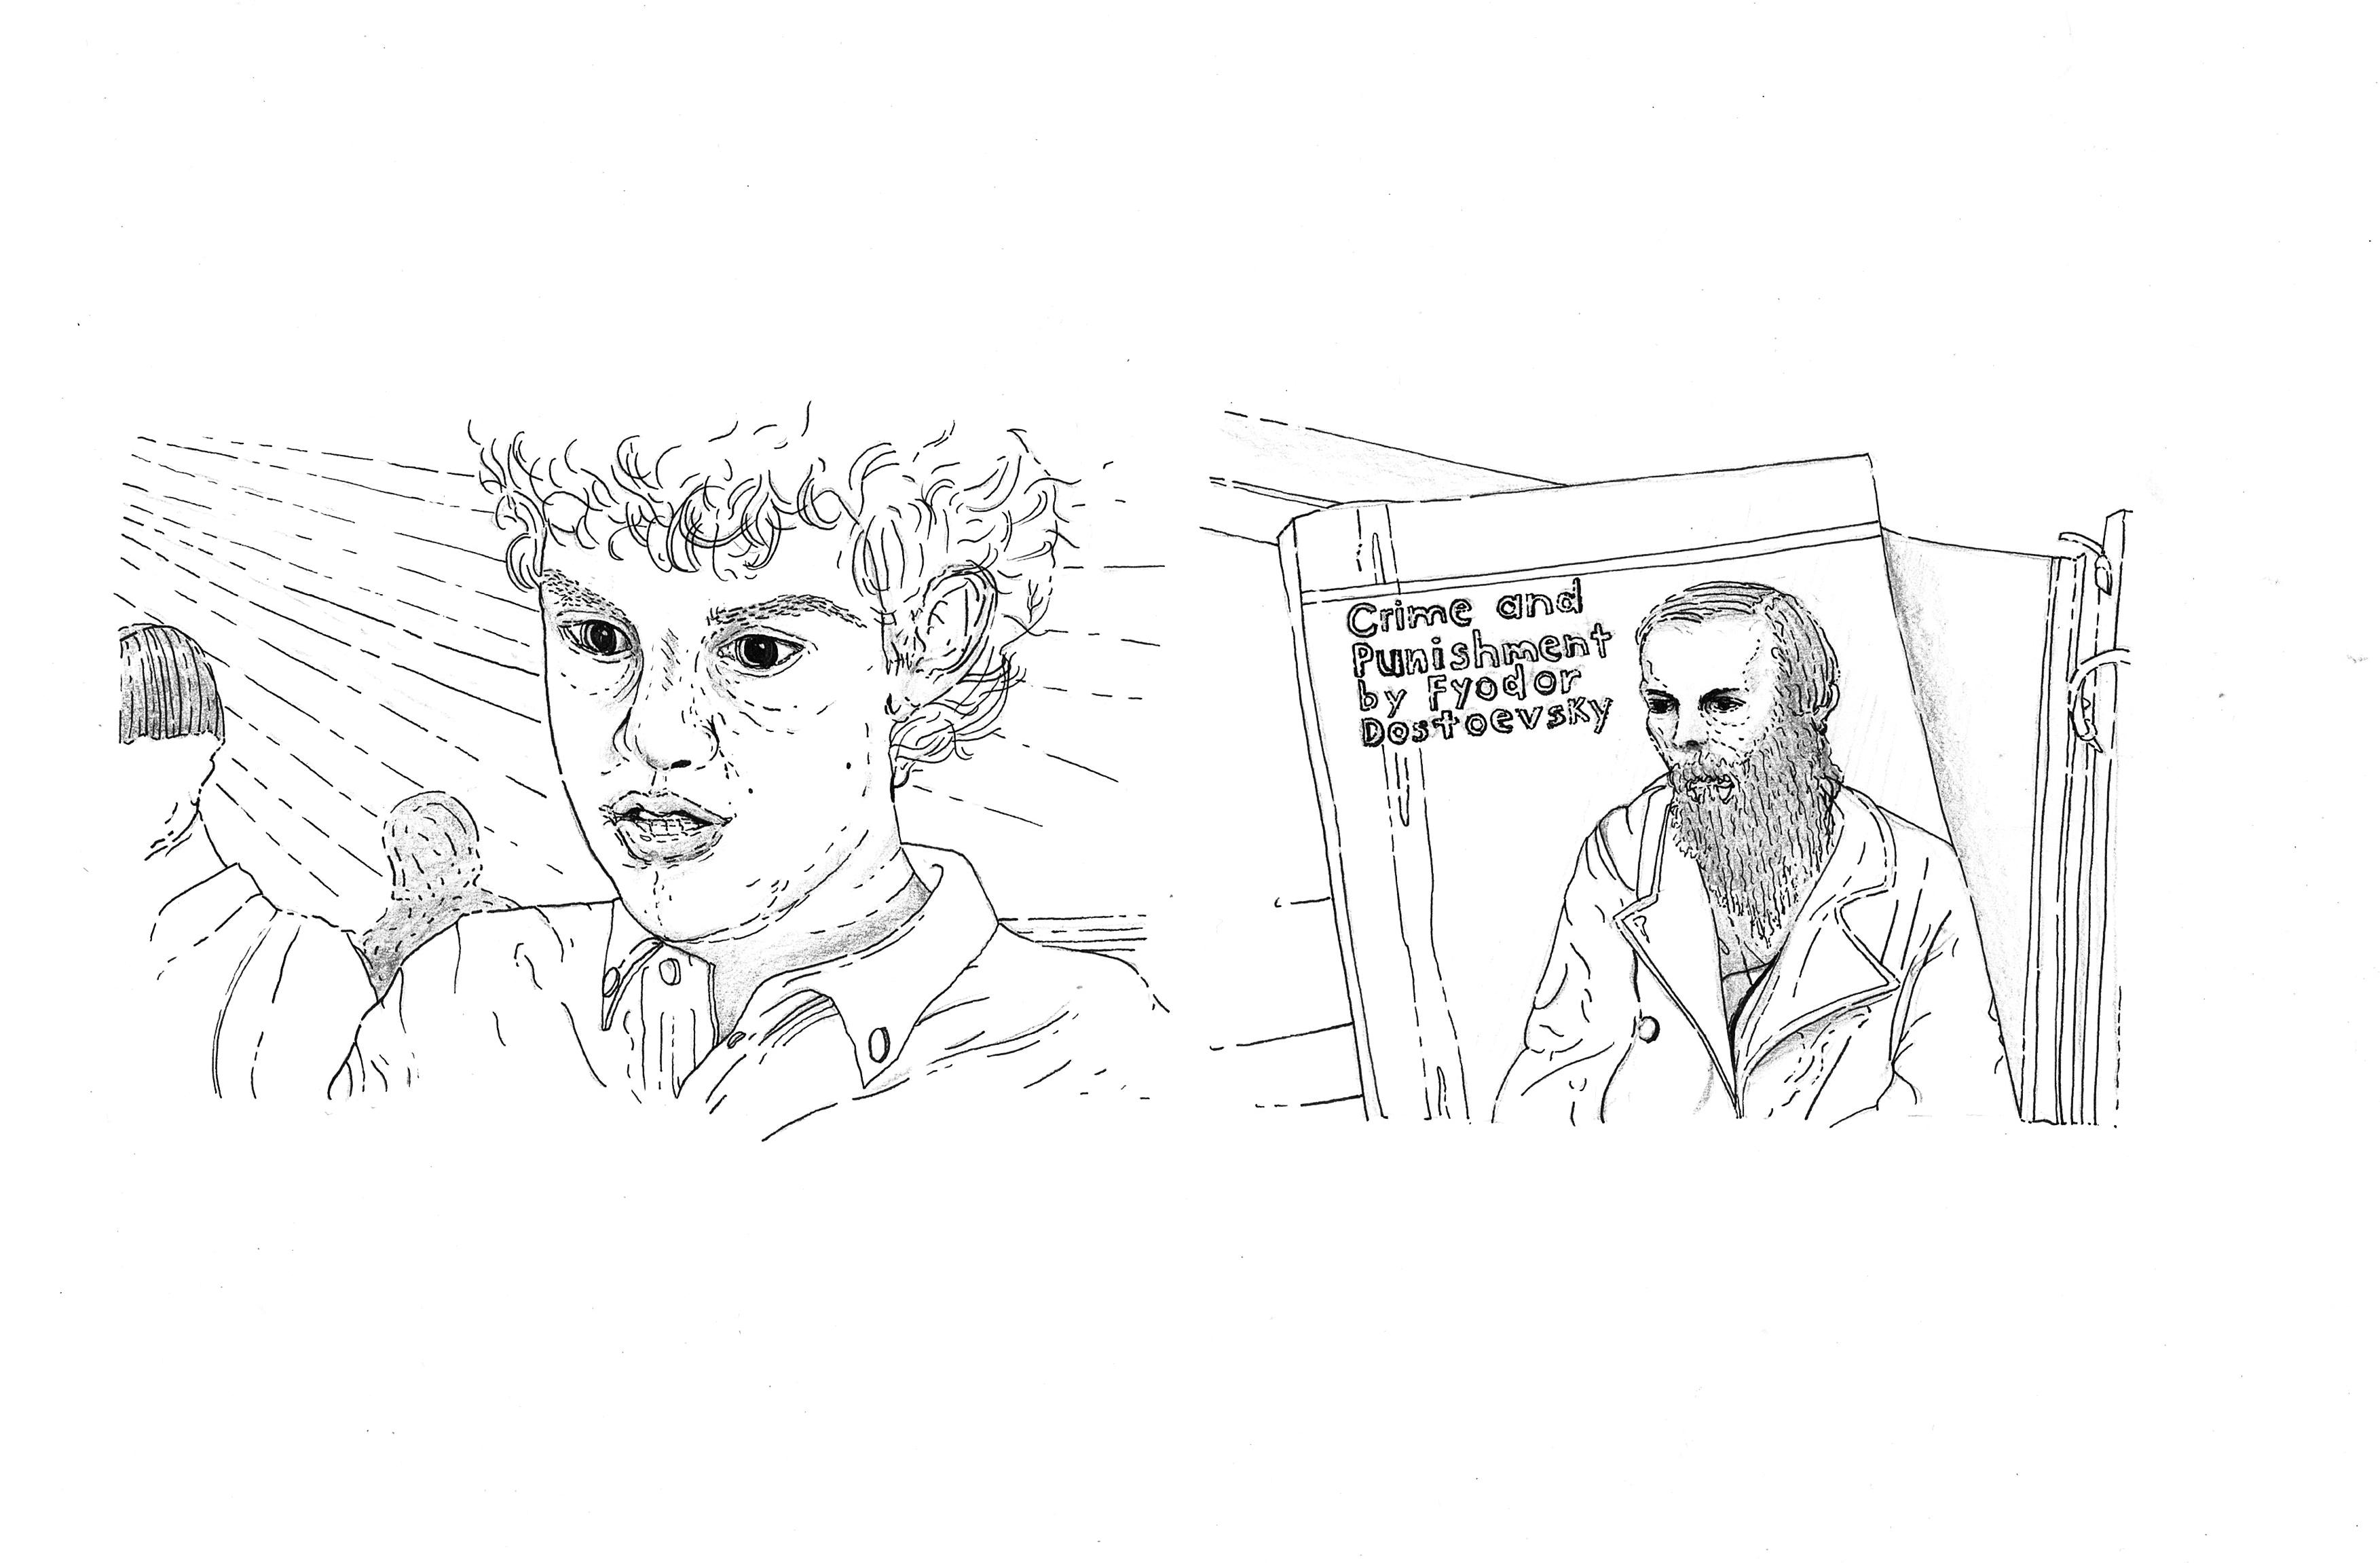 Sam Weir: Crime and Punishment